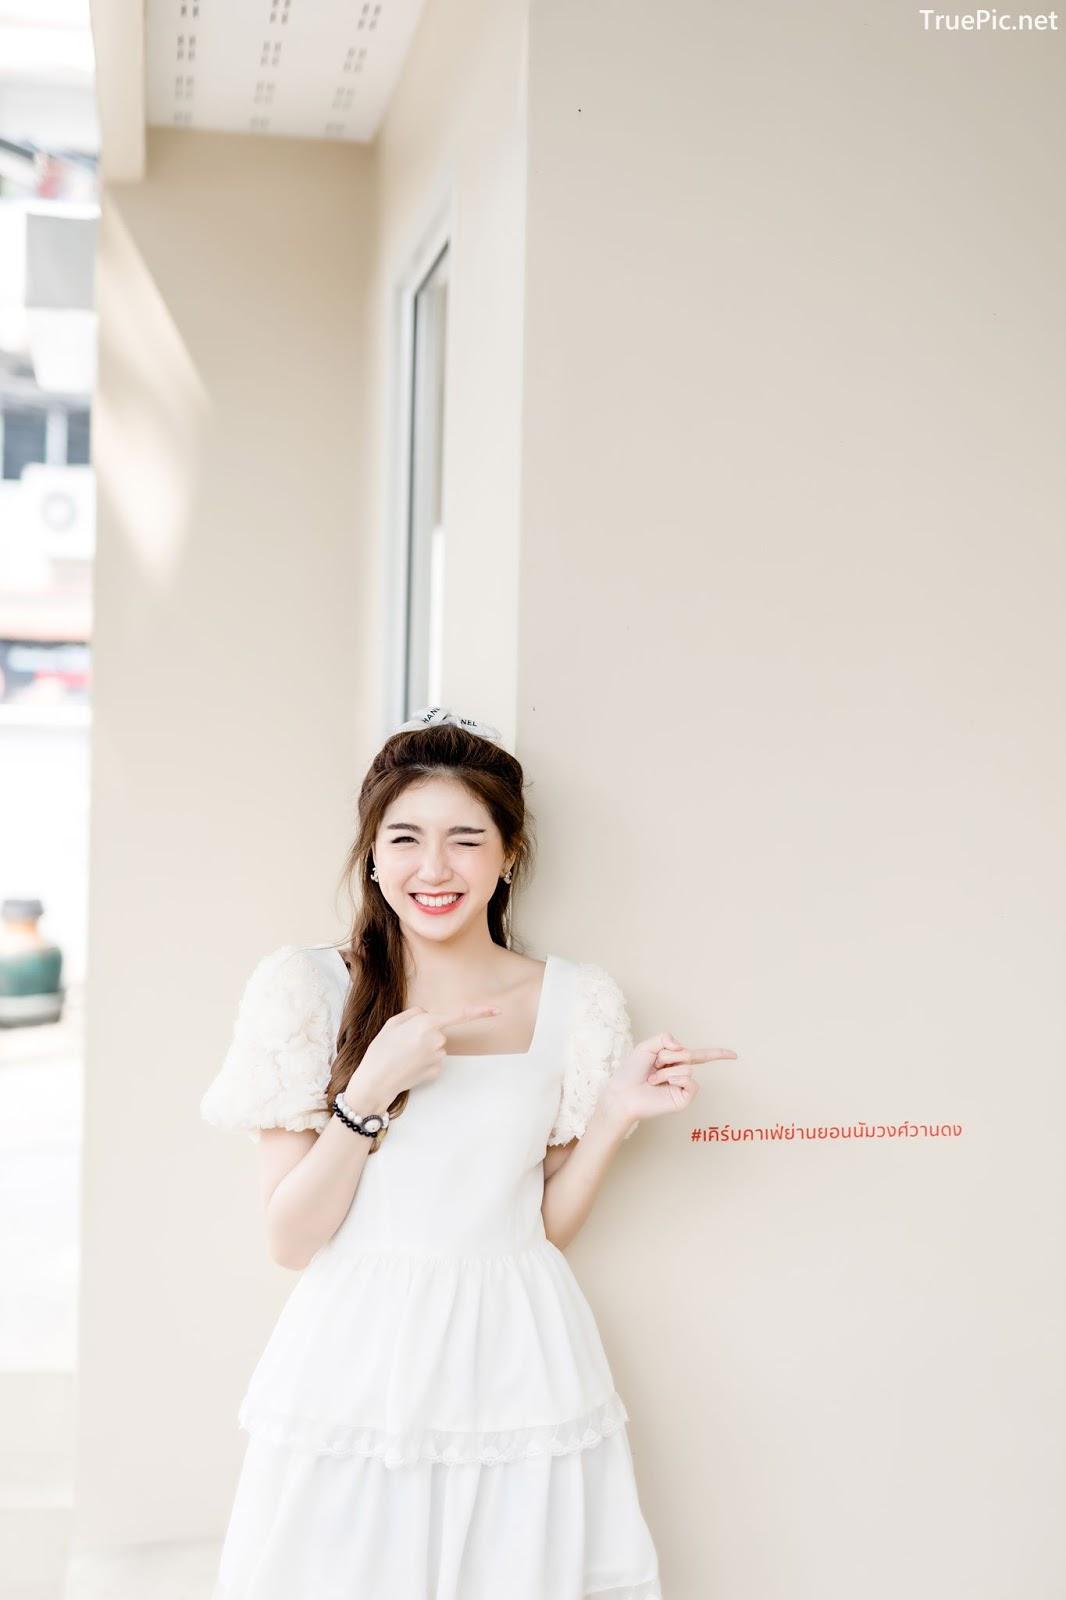 Image Thailand Model - Sasi Ngiunwan - Barbie Doll Smile - TruePic.net - Picture-10